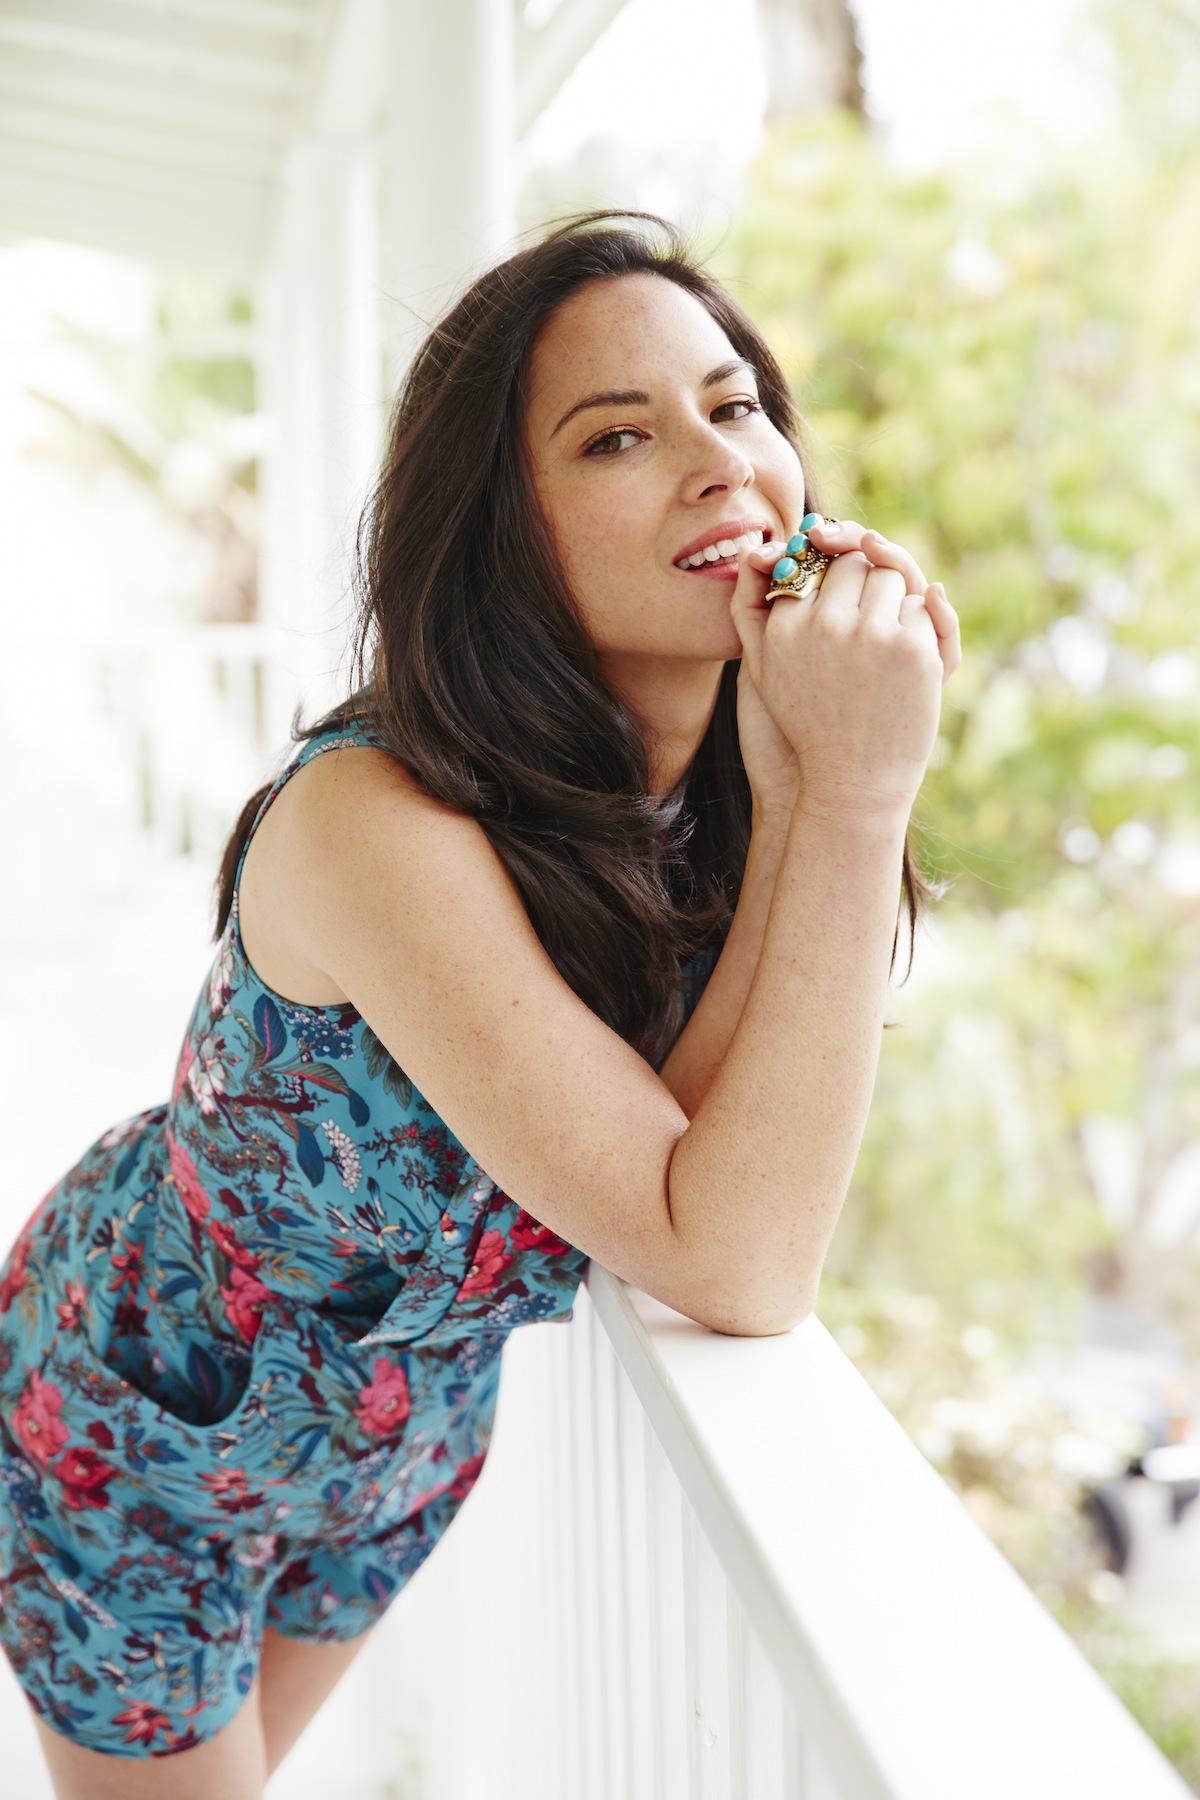 Melanie Acevedo photographs actress Olivia Munn for spring ... Olivia Munn